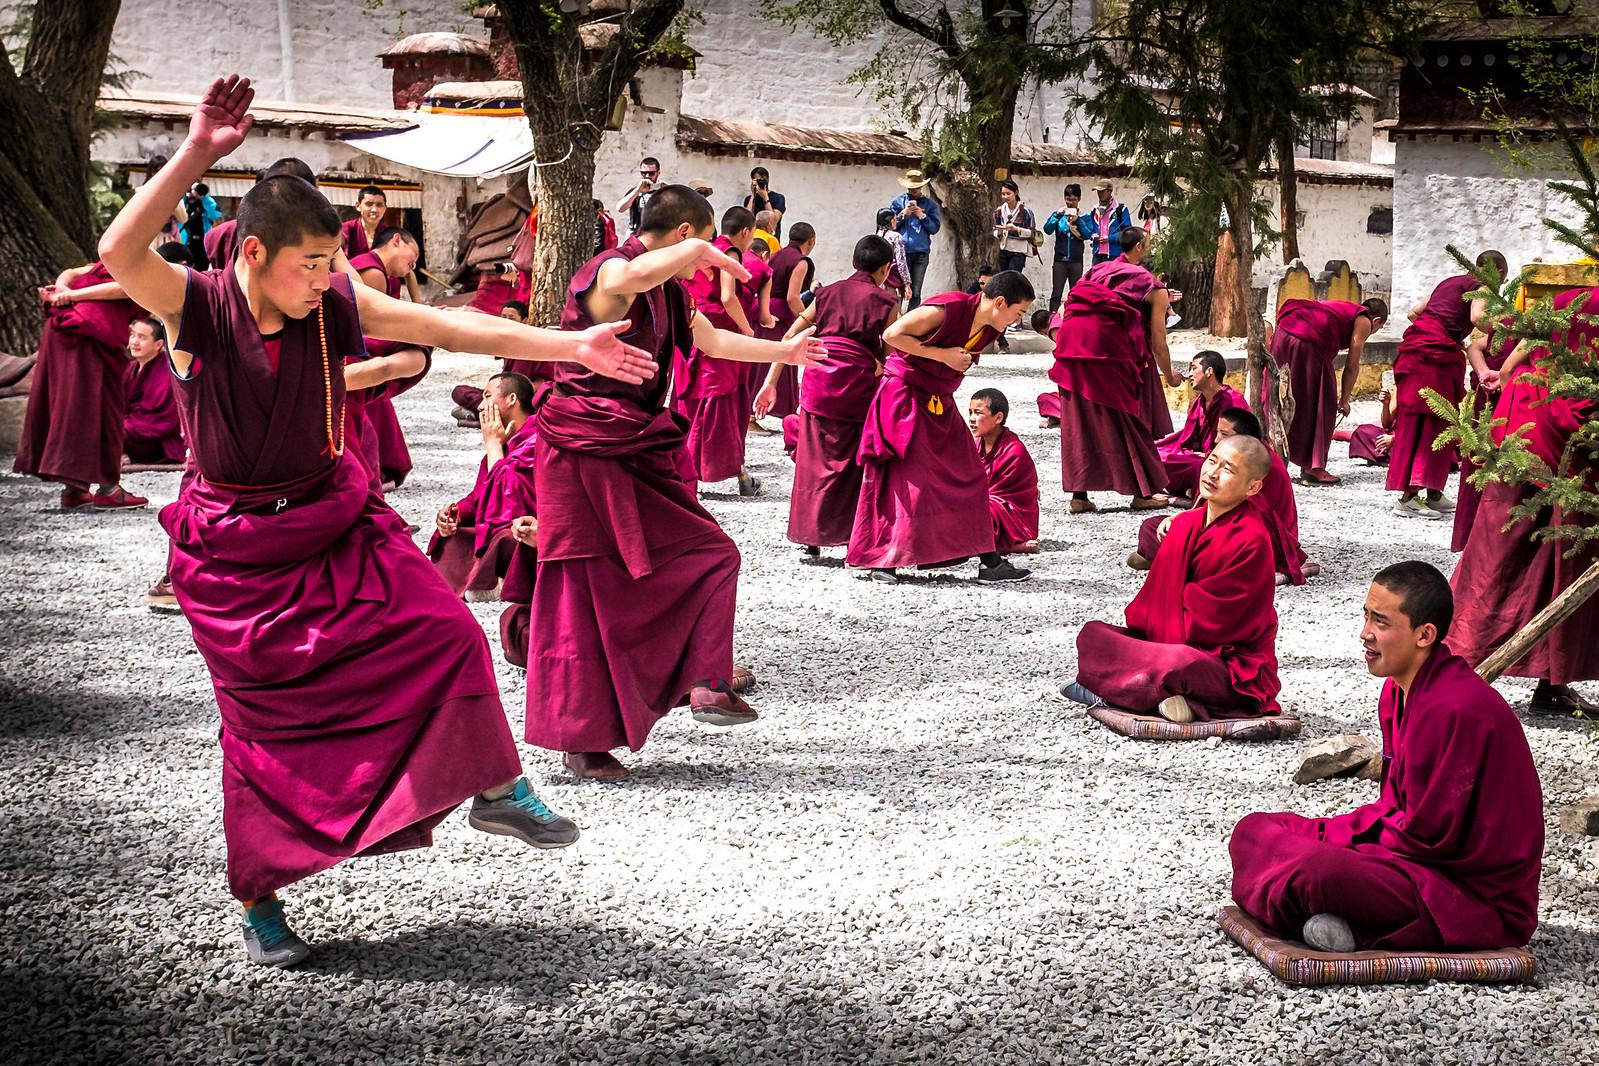 Tibetan monks practice formal debating in Lhasa